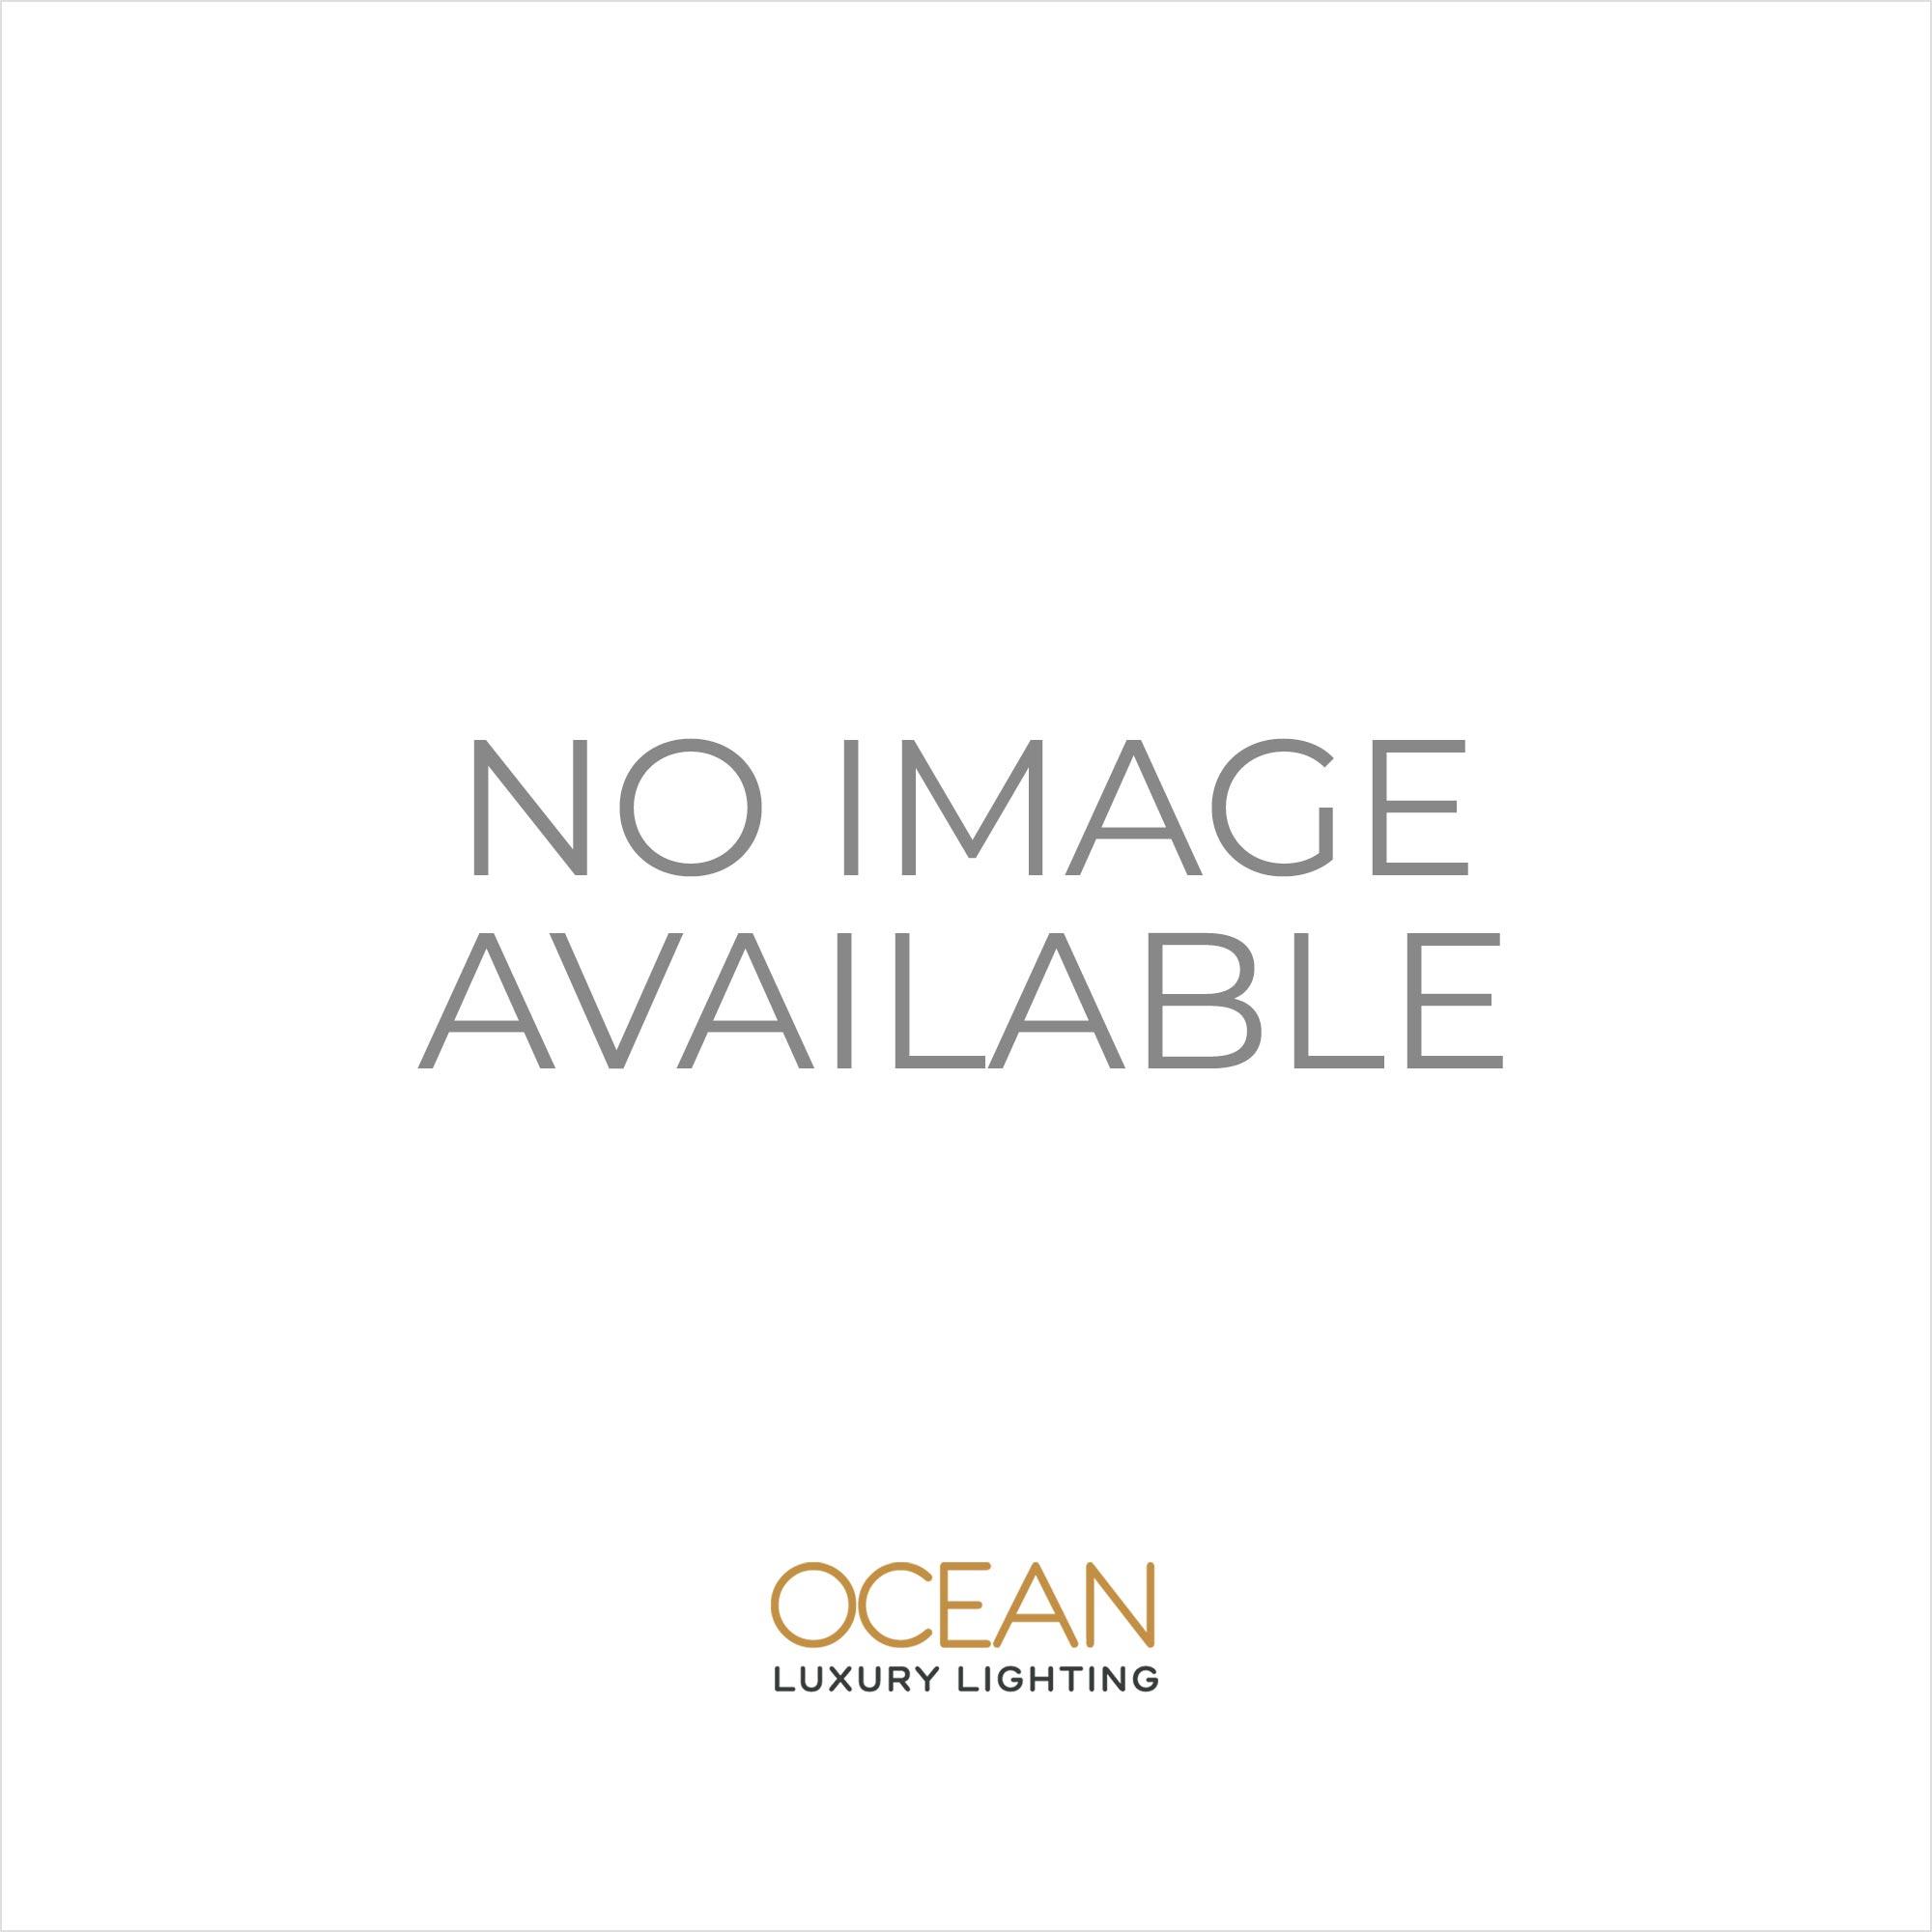 EL 174 Delta 4 Light Bathroom Mirrored Ceiling Spotlight Polished Chrome  IP44